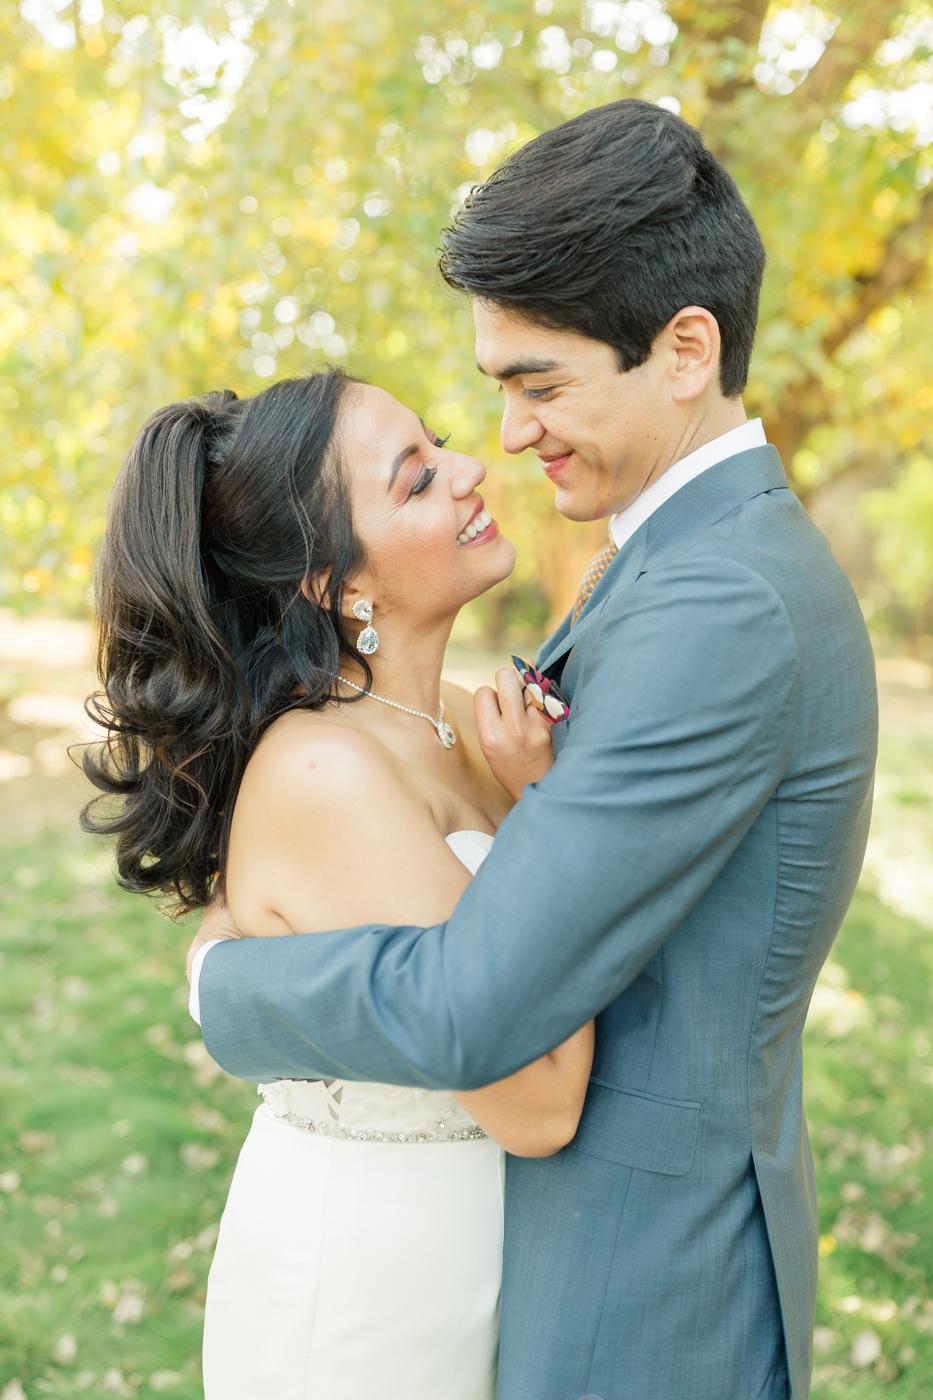 Orange County Wedding Photographer, Christa Norman Photography, Orange County Wedding Photographer, San Clemente Wedding Photographer, Southern California Wedding Photographer Japan Wedding Photographer, Film Wedding Photographer